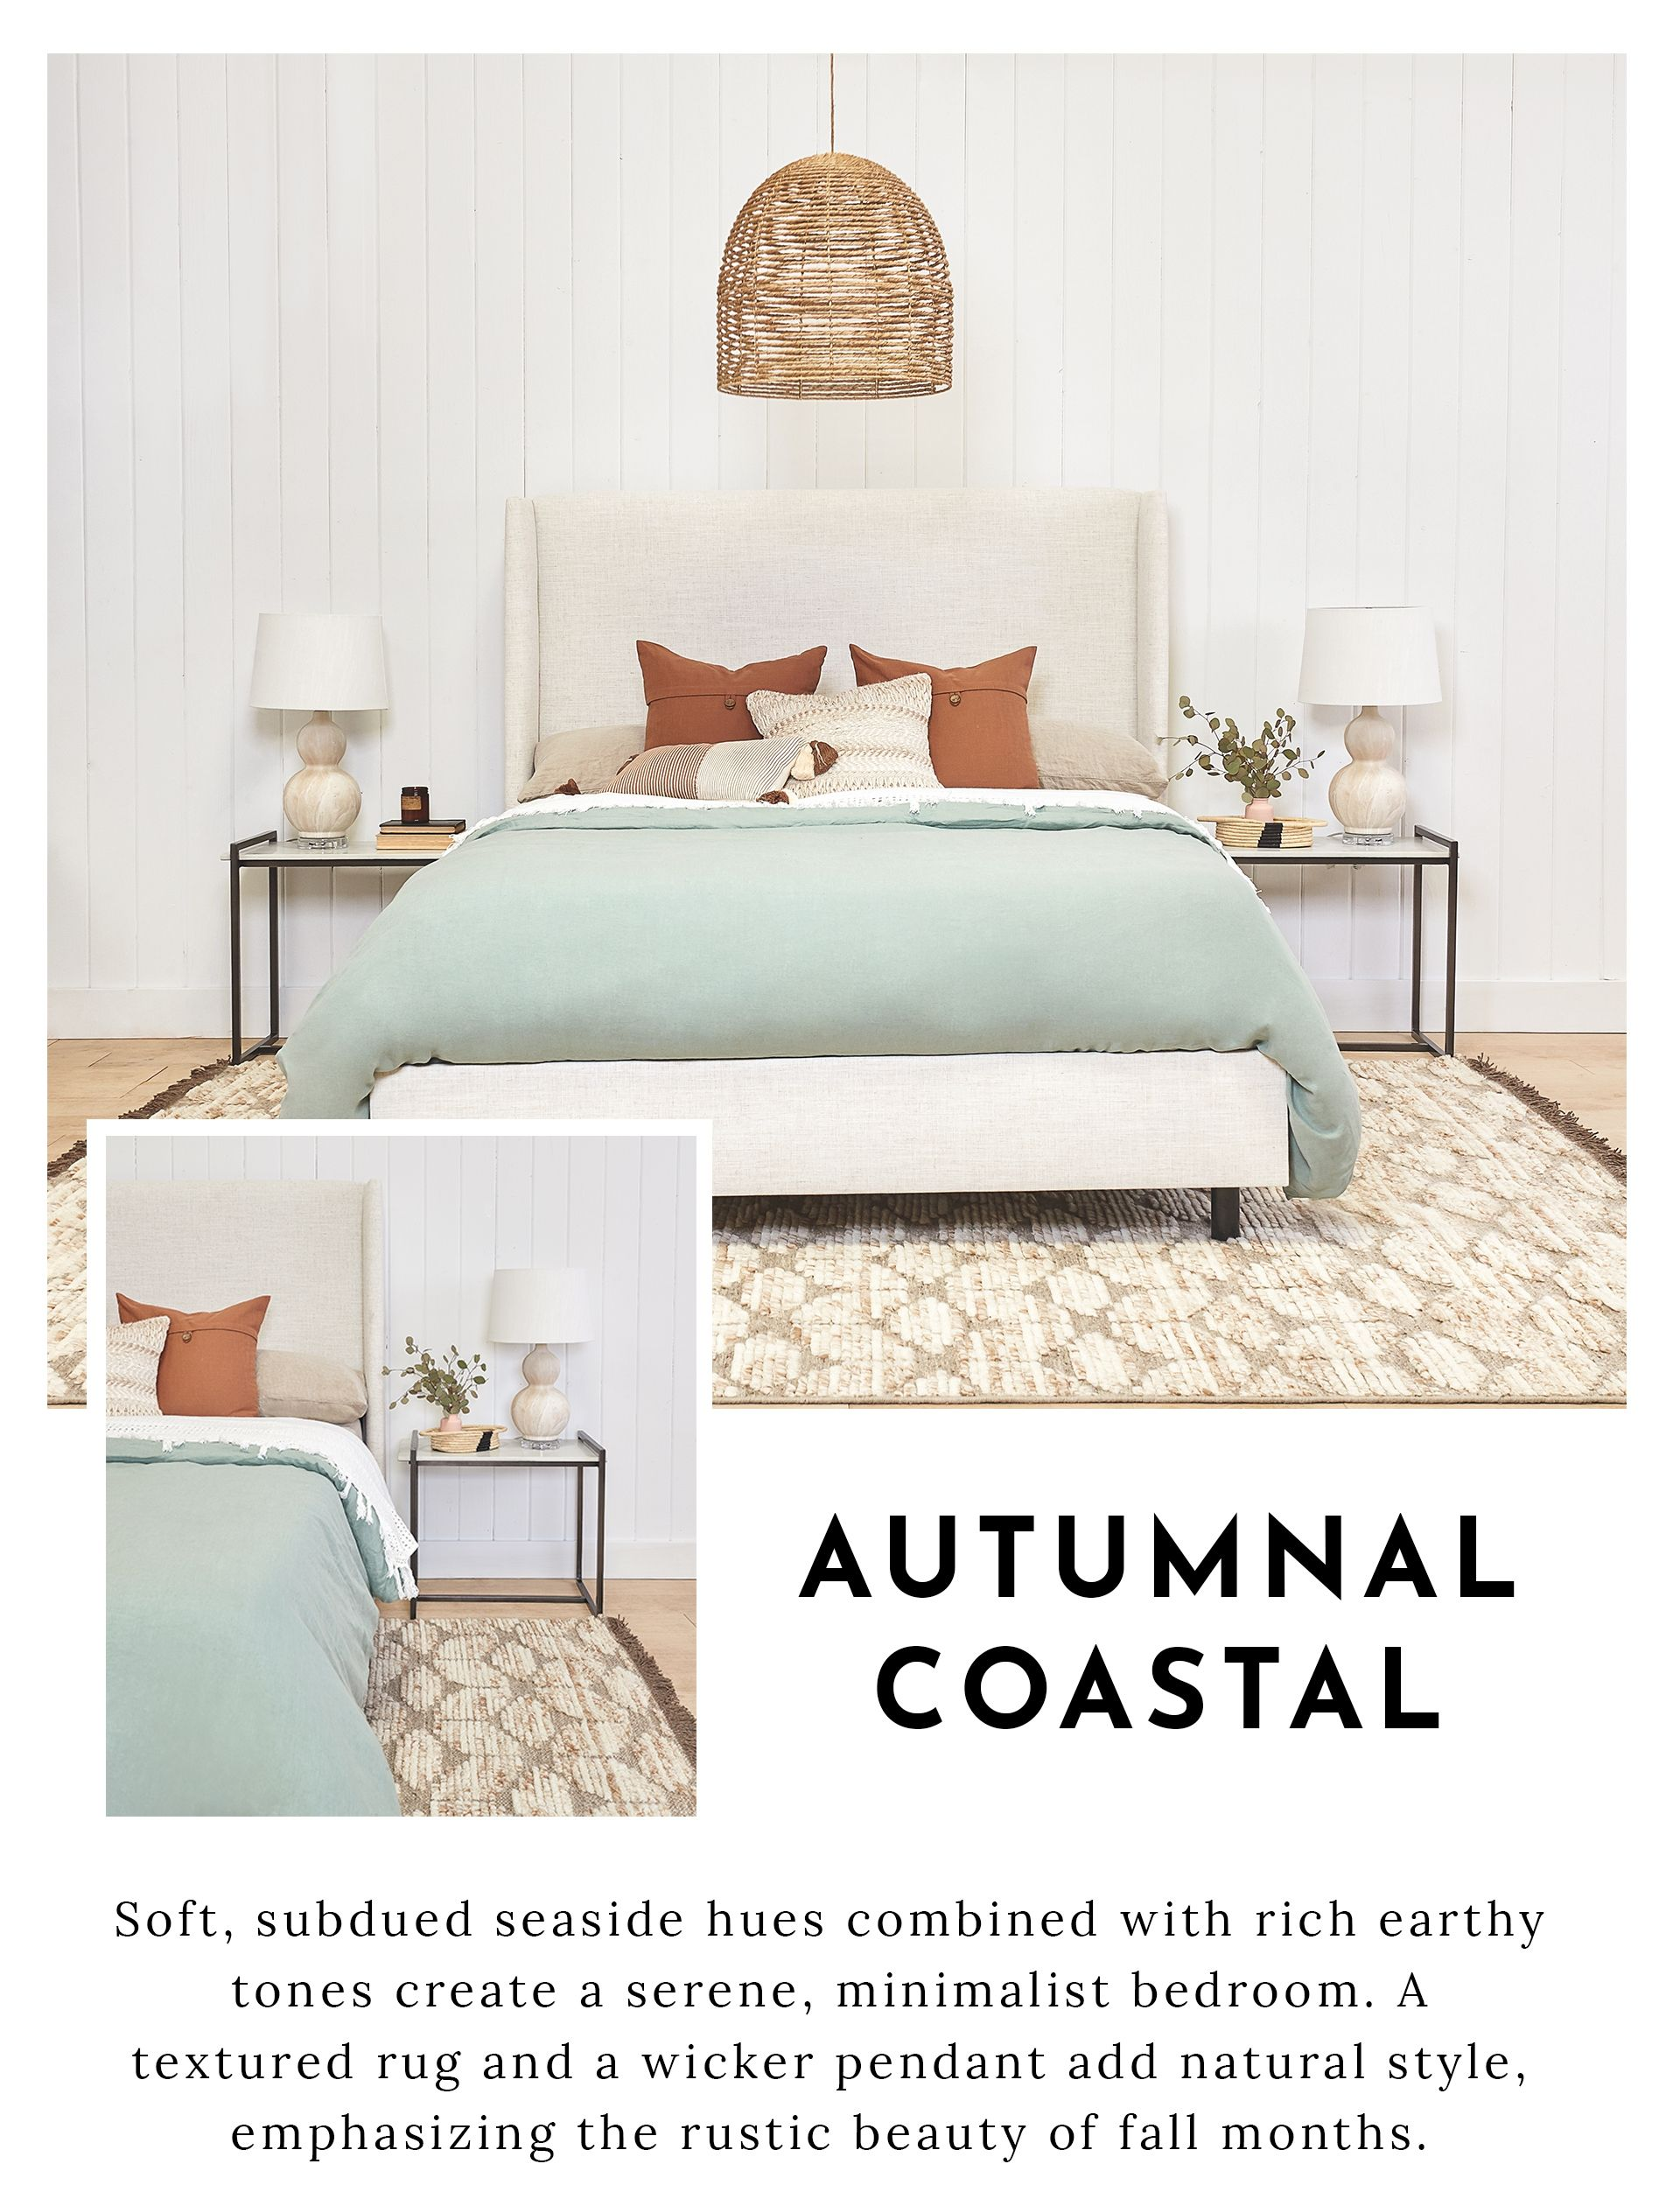 Fall/Winter 2018 Autumnal Coastal Coastal style